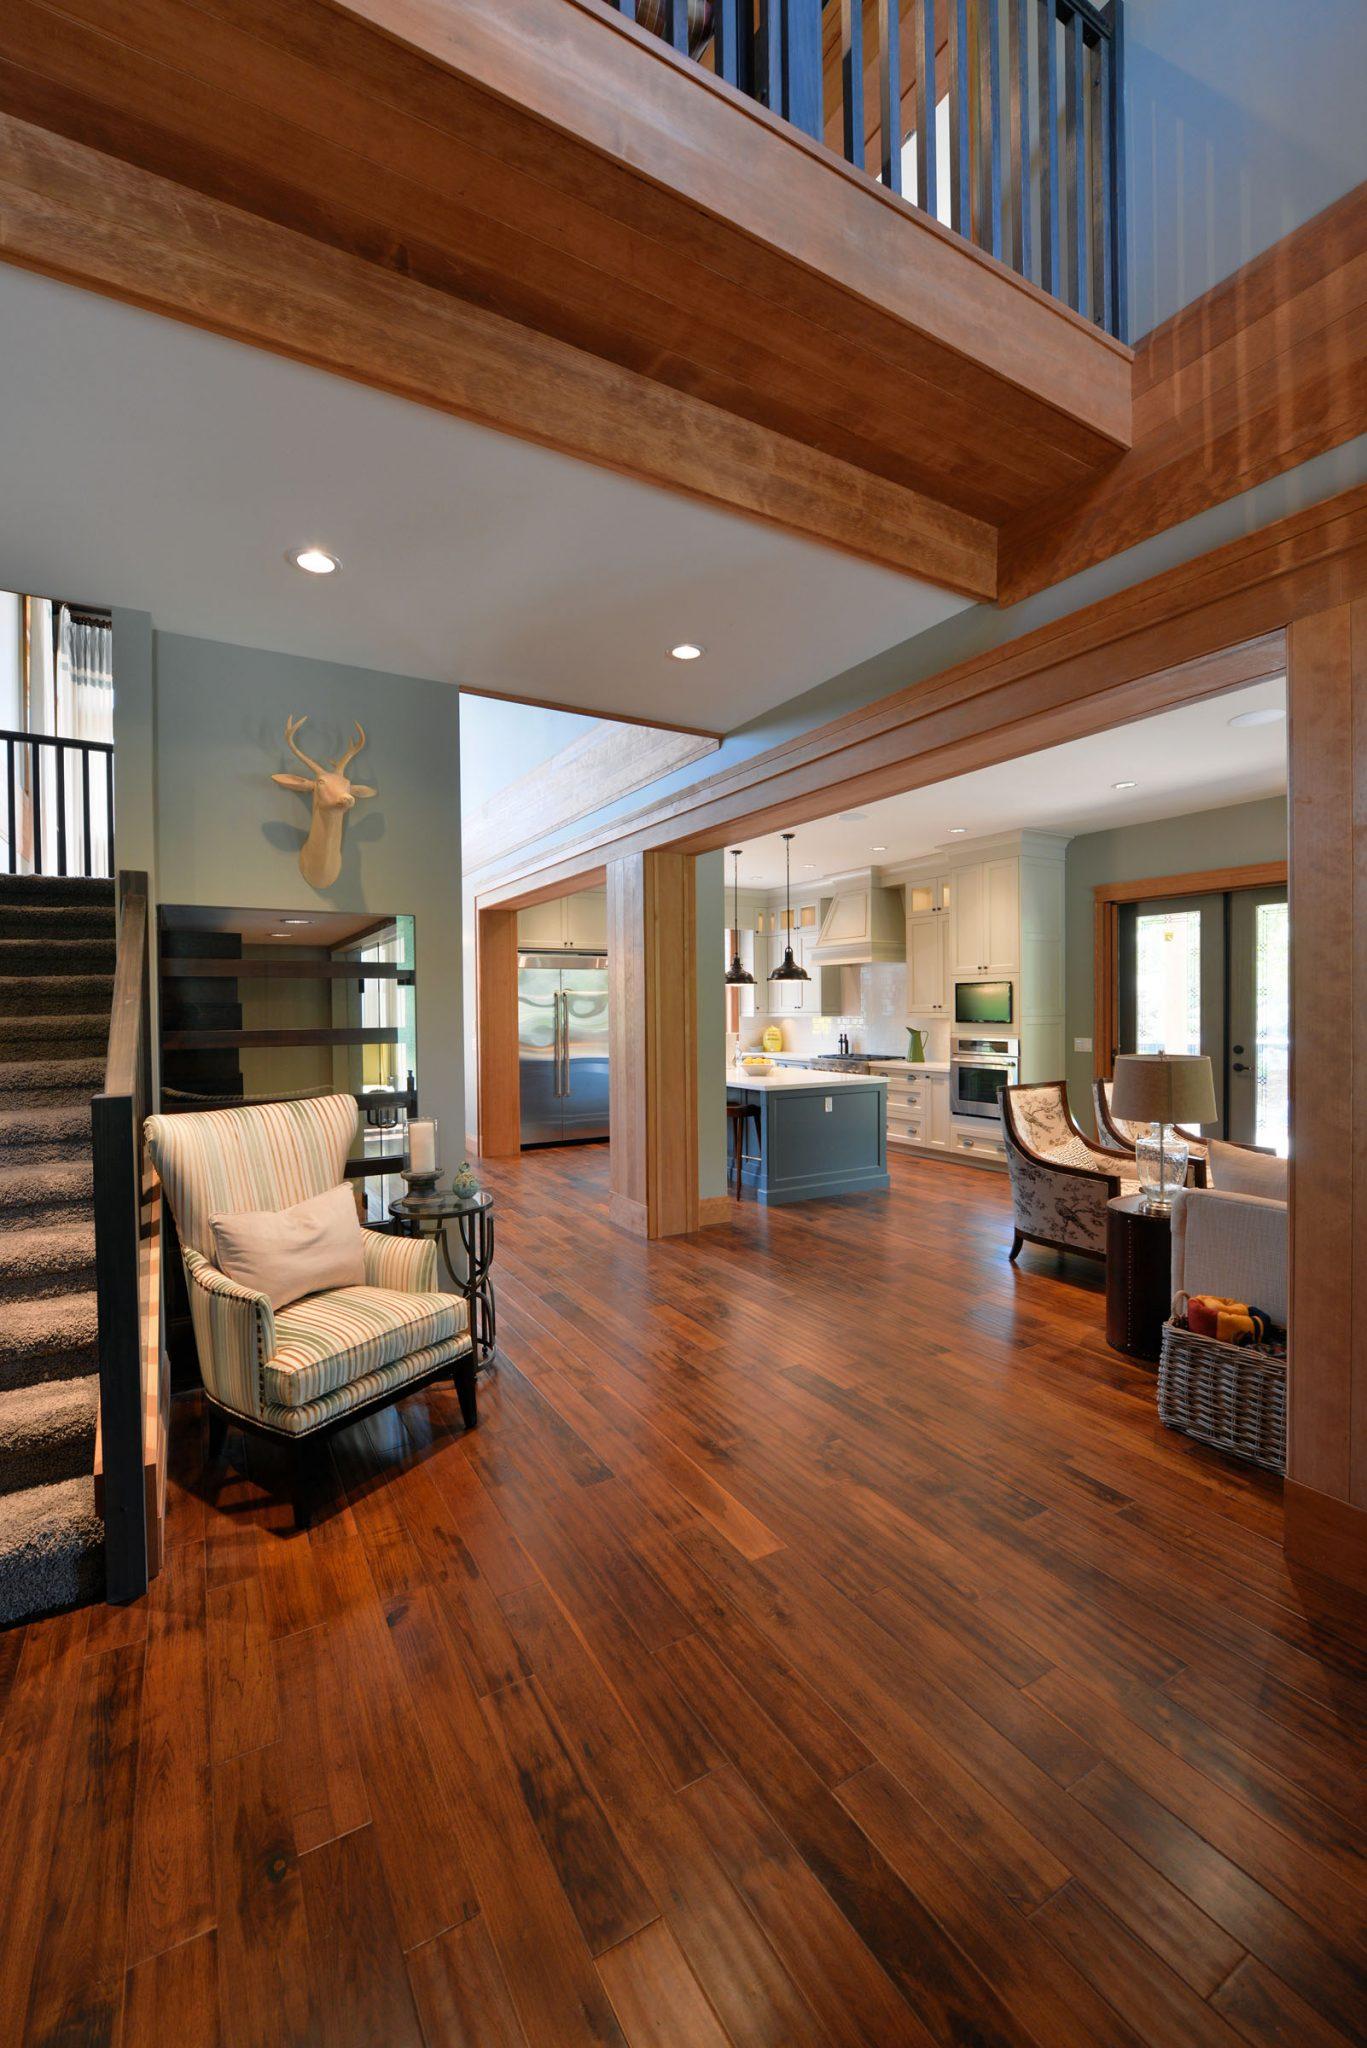 The Eco Floor Store Flooring Home Renovation